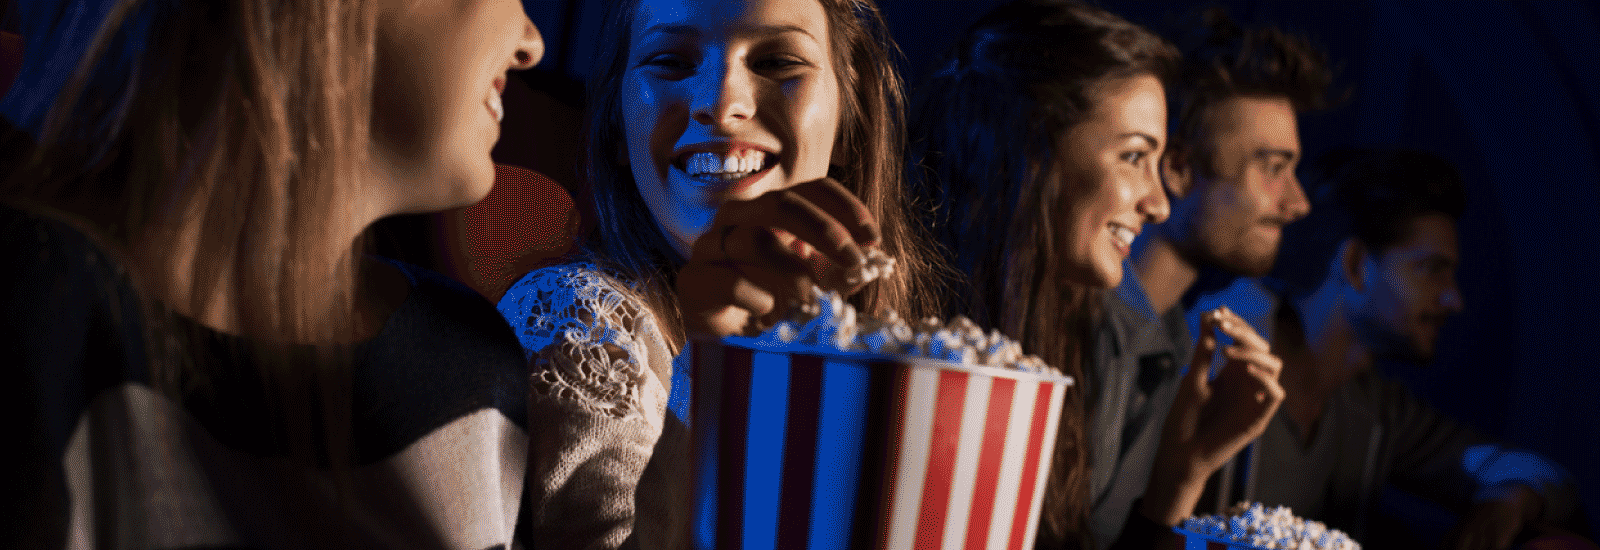 Holloman AFB Movie Theater